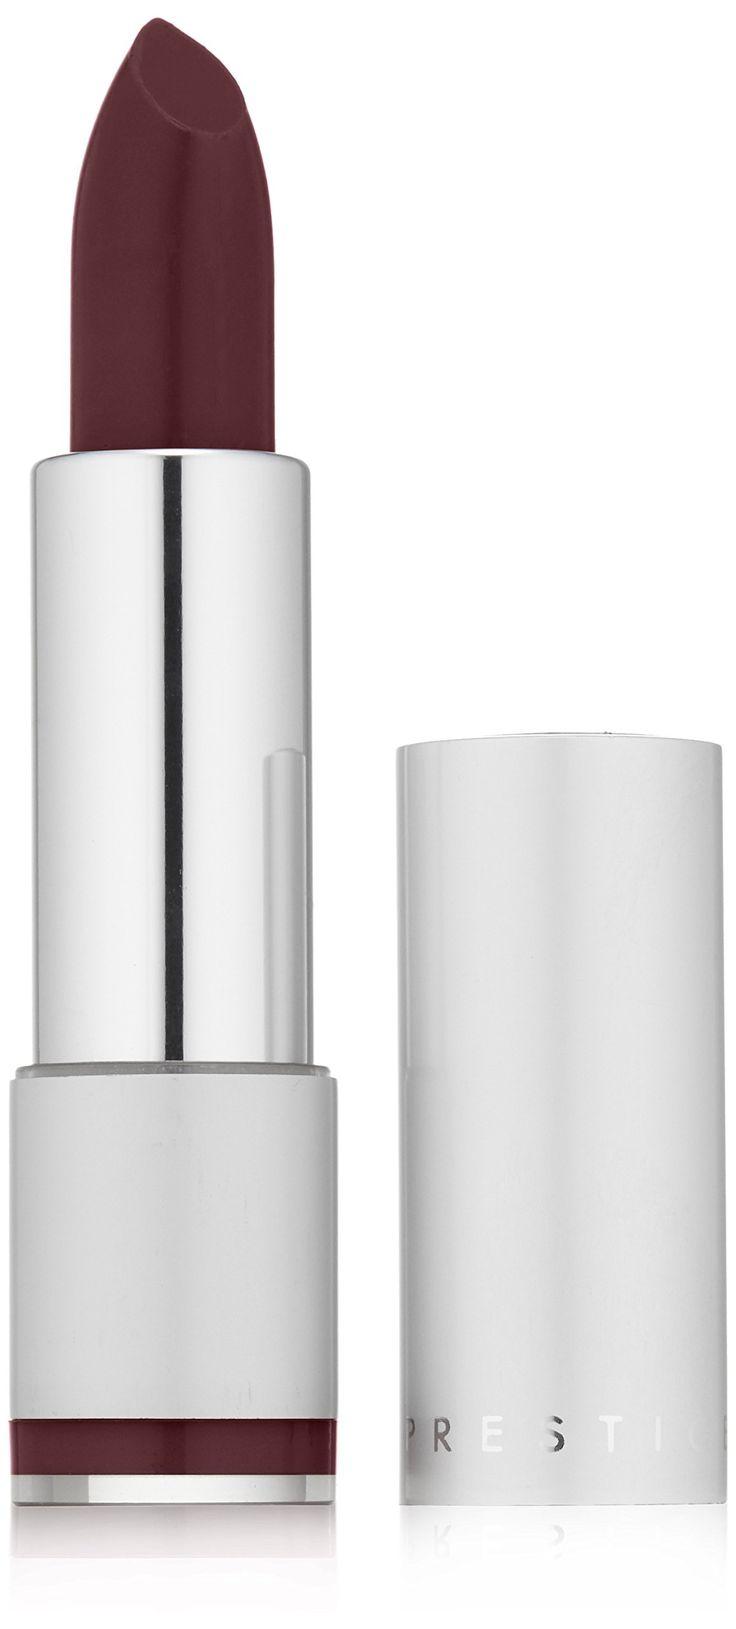 Prestige Cosmetics Lipstick, Belize, 0.15 Ounce. Moisture intense. Vitamin enriched. Lightweight. Creamy texture. Long wearing shades.